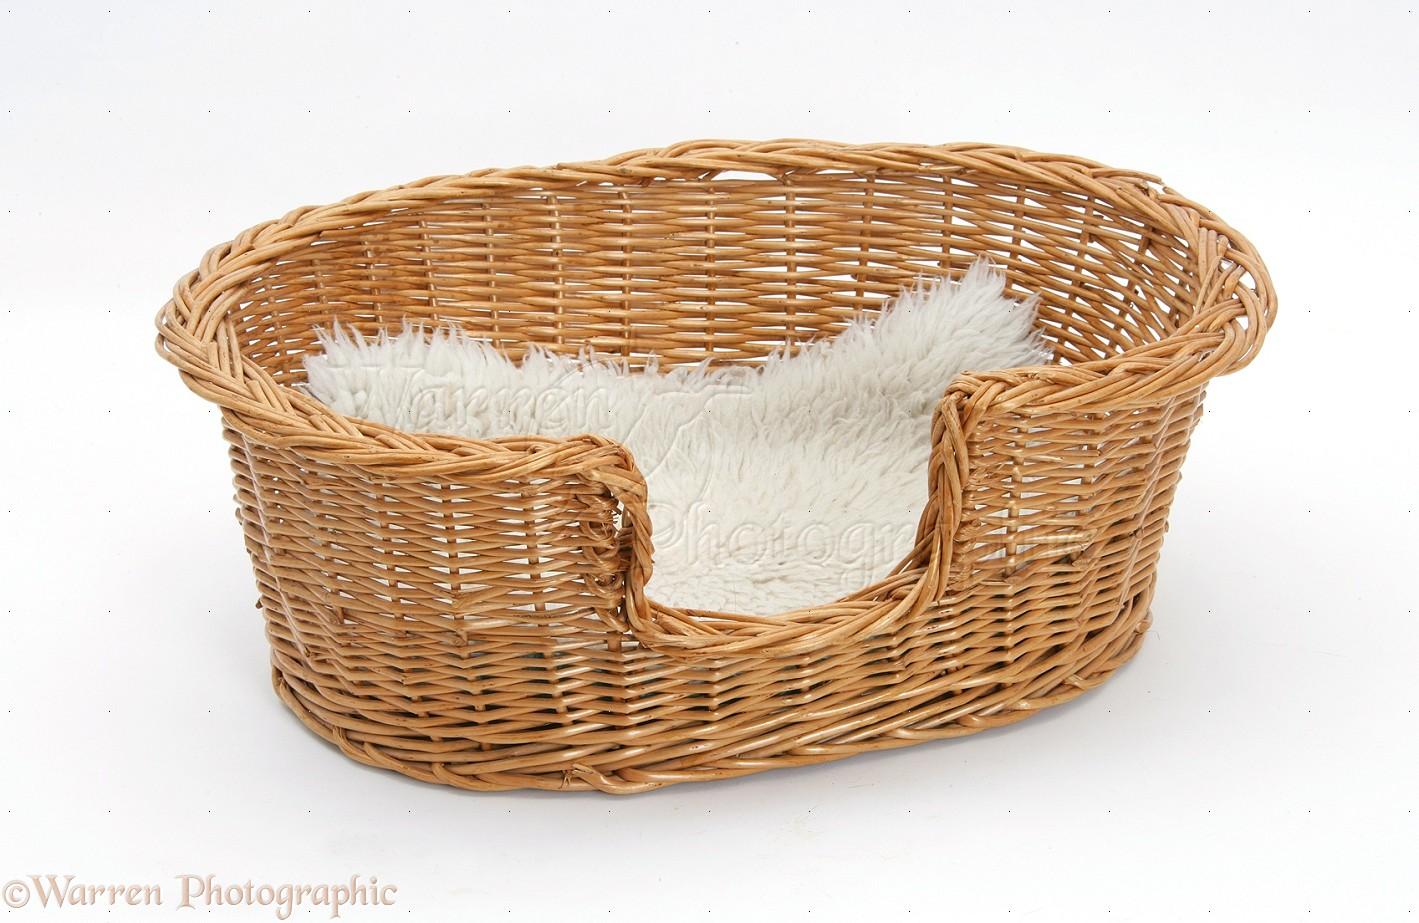 Cat Basket Clipart : Wicker cat basket photo wp